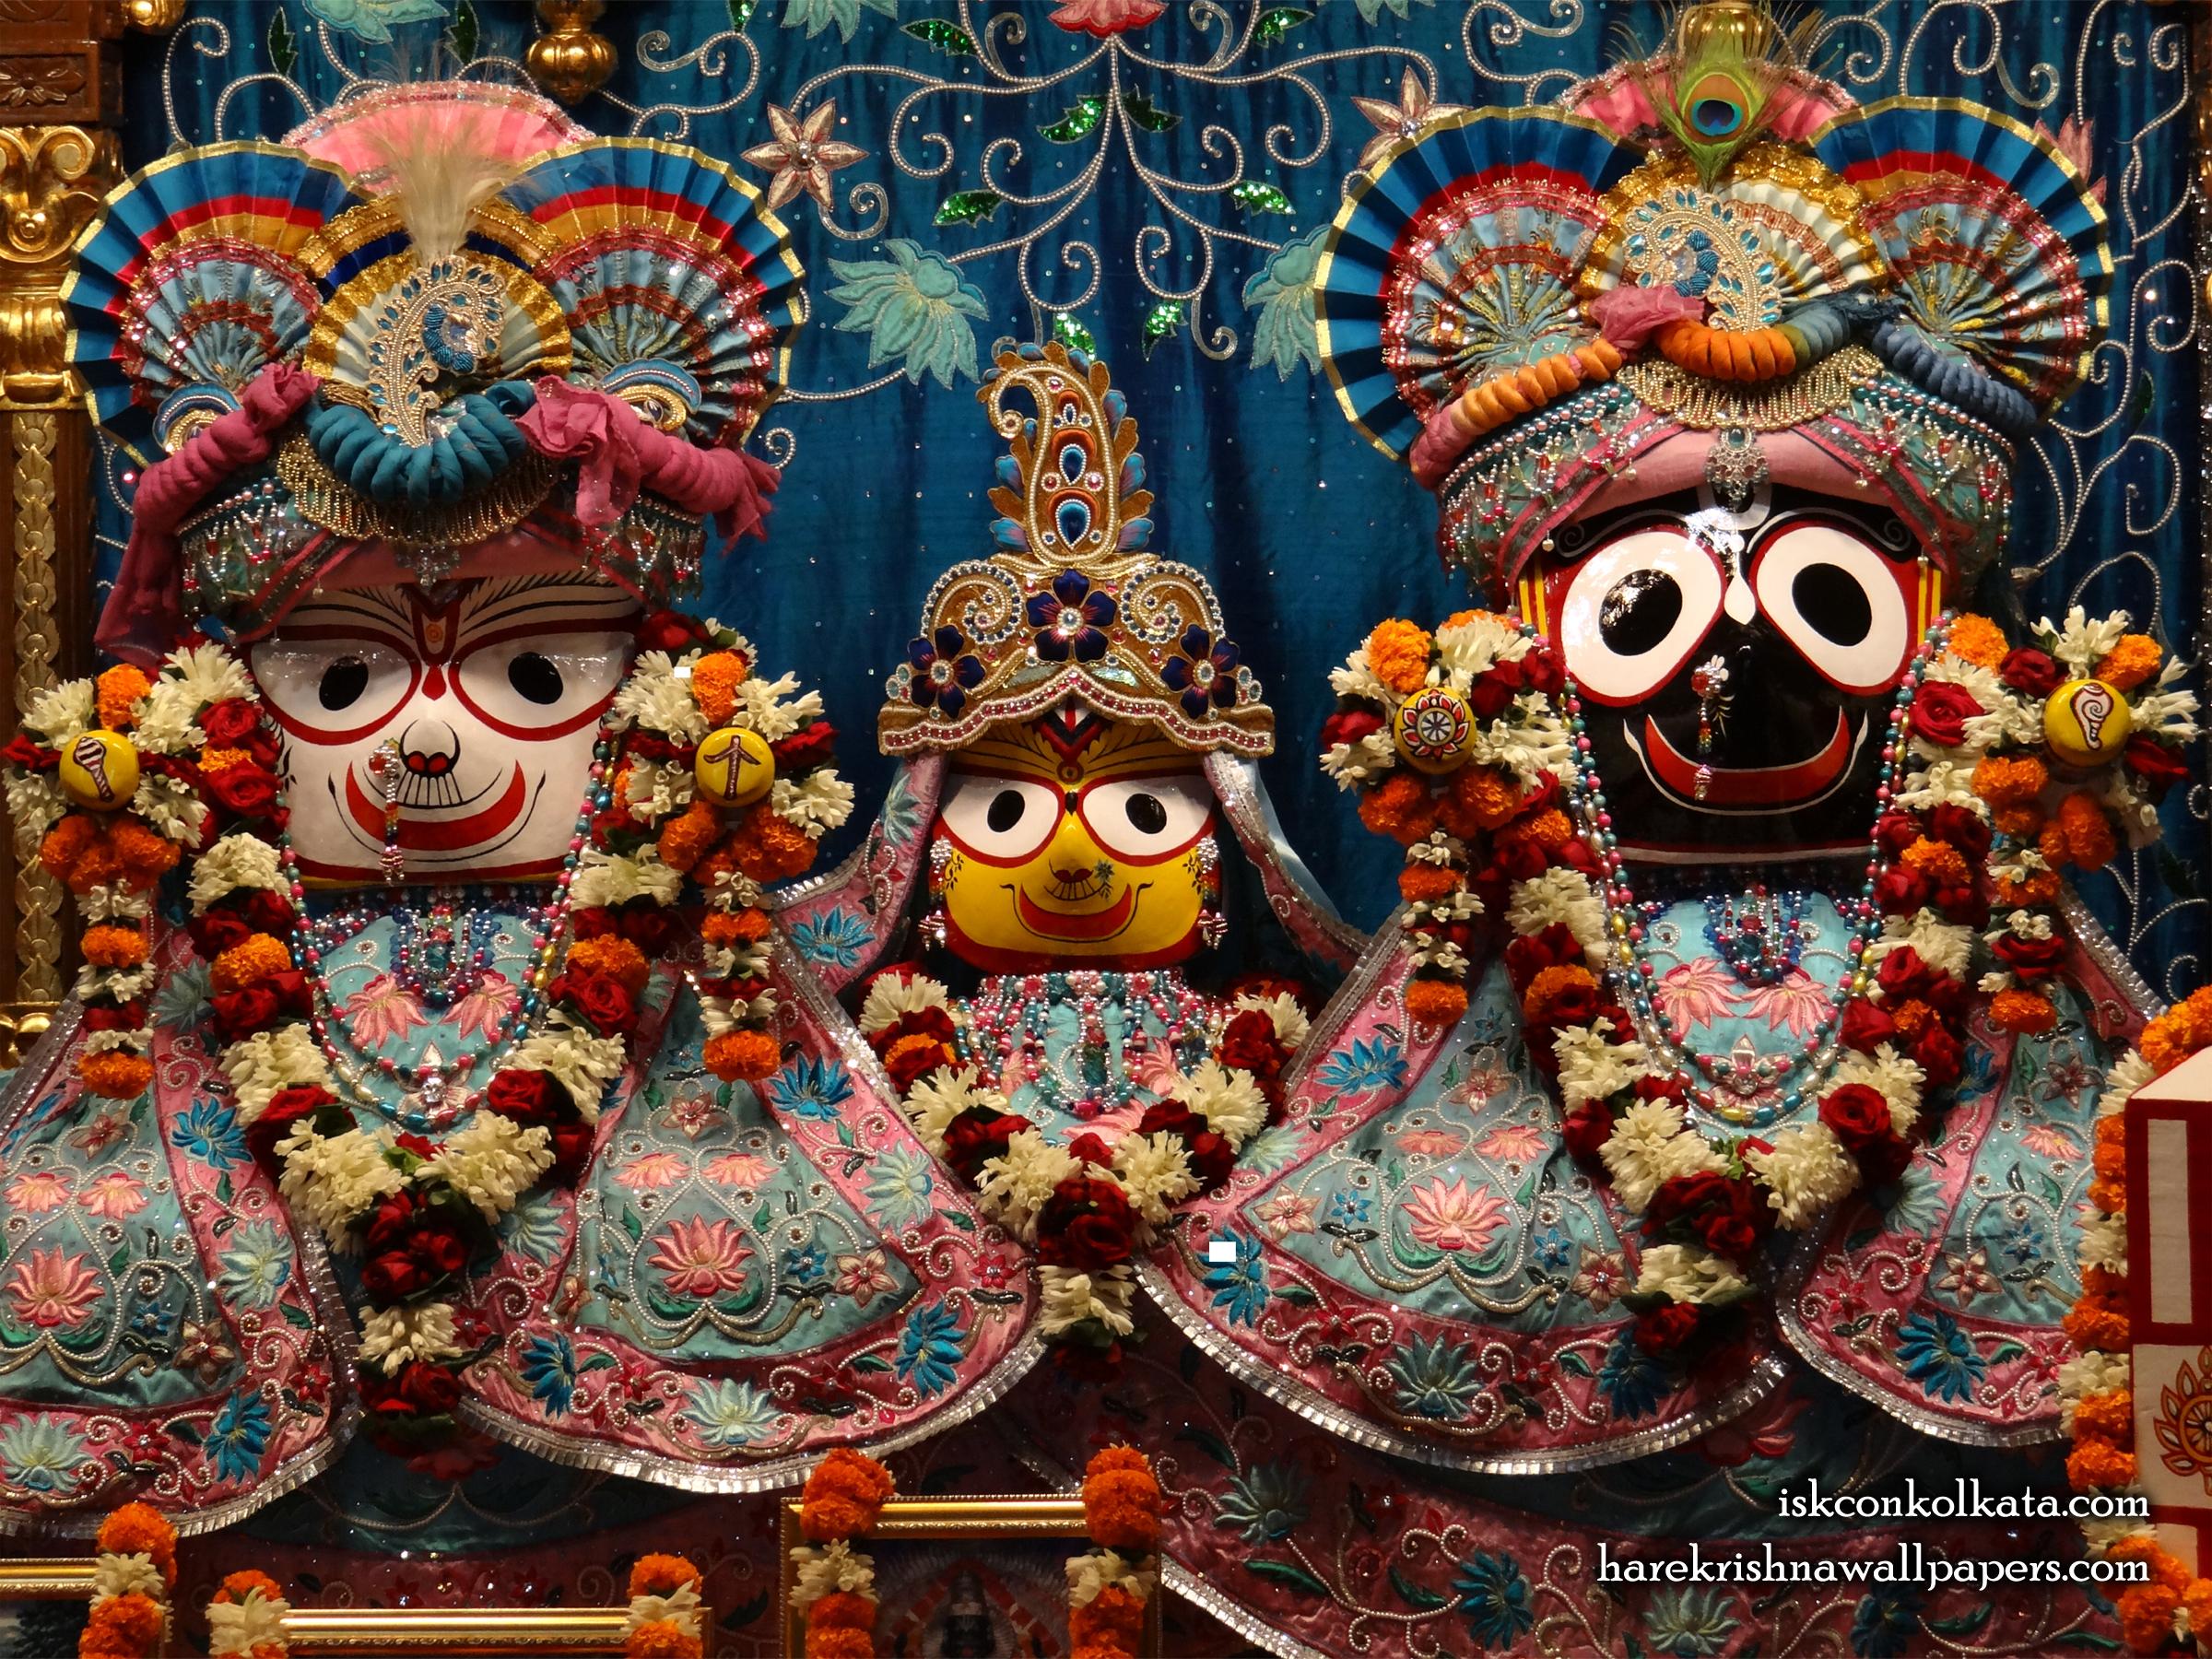 Jagannath Baladeva Subhadra Wallpaper (003) Size 2400x1800 Download